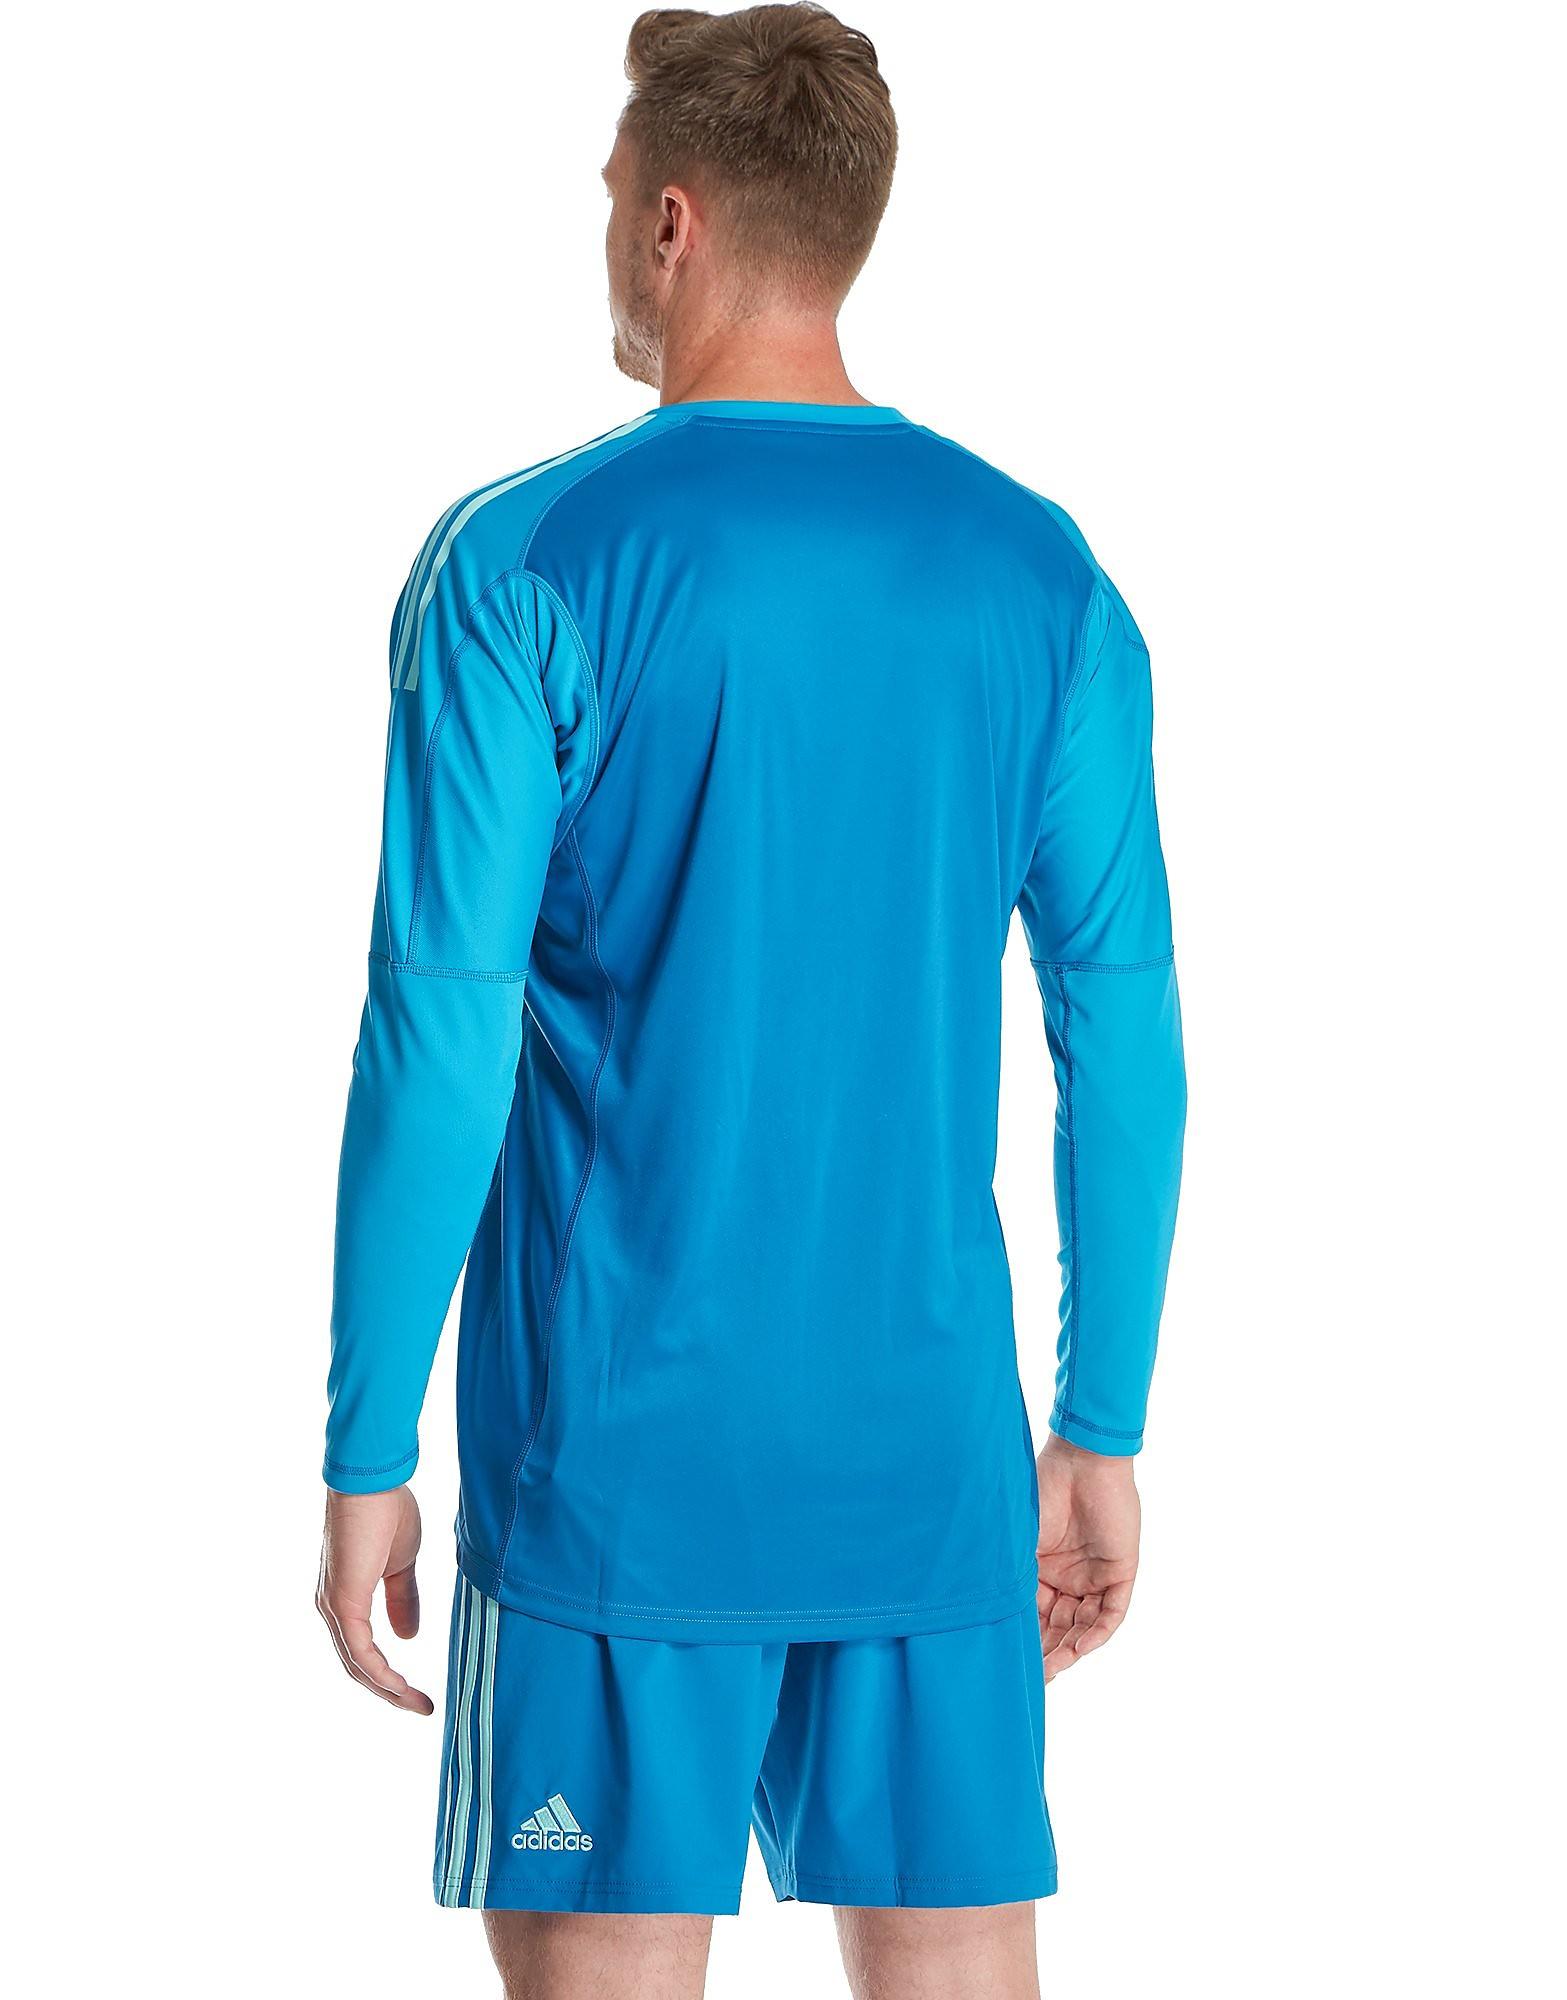 adidas Wales 2018 Home Goalkeeper Shirt